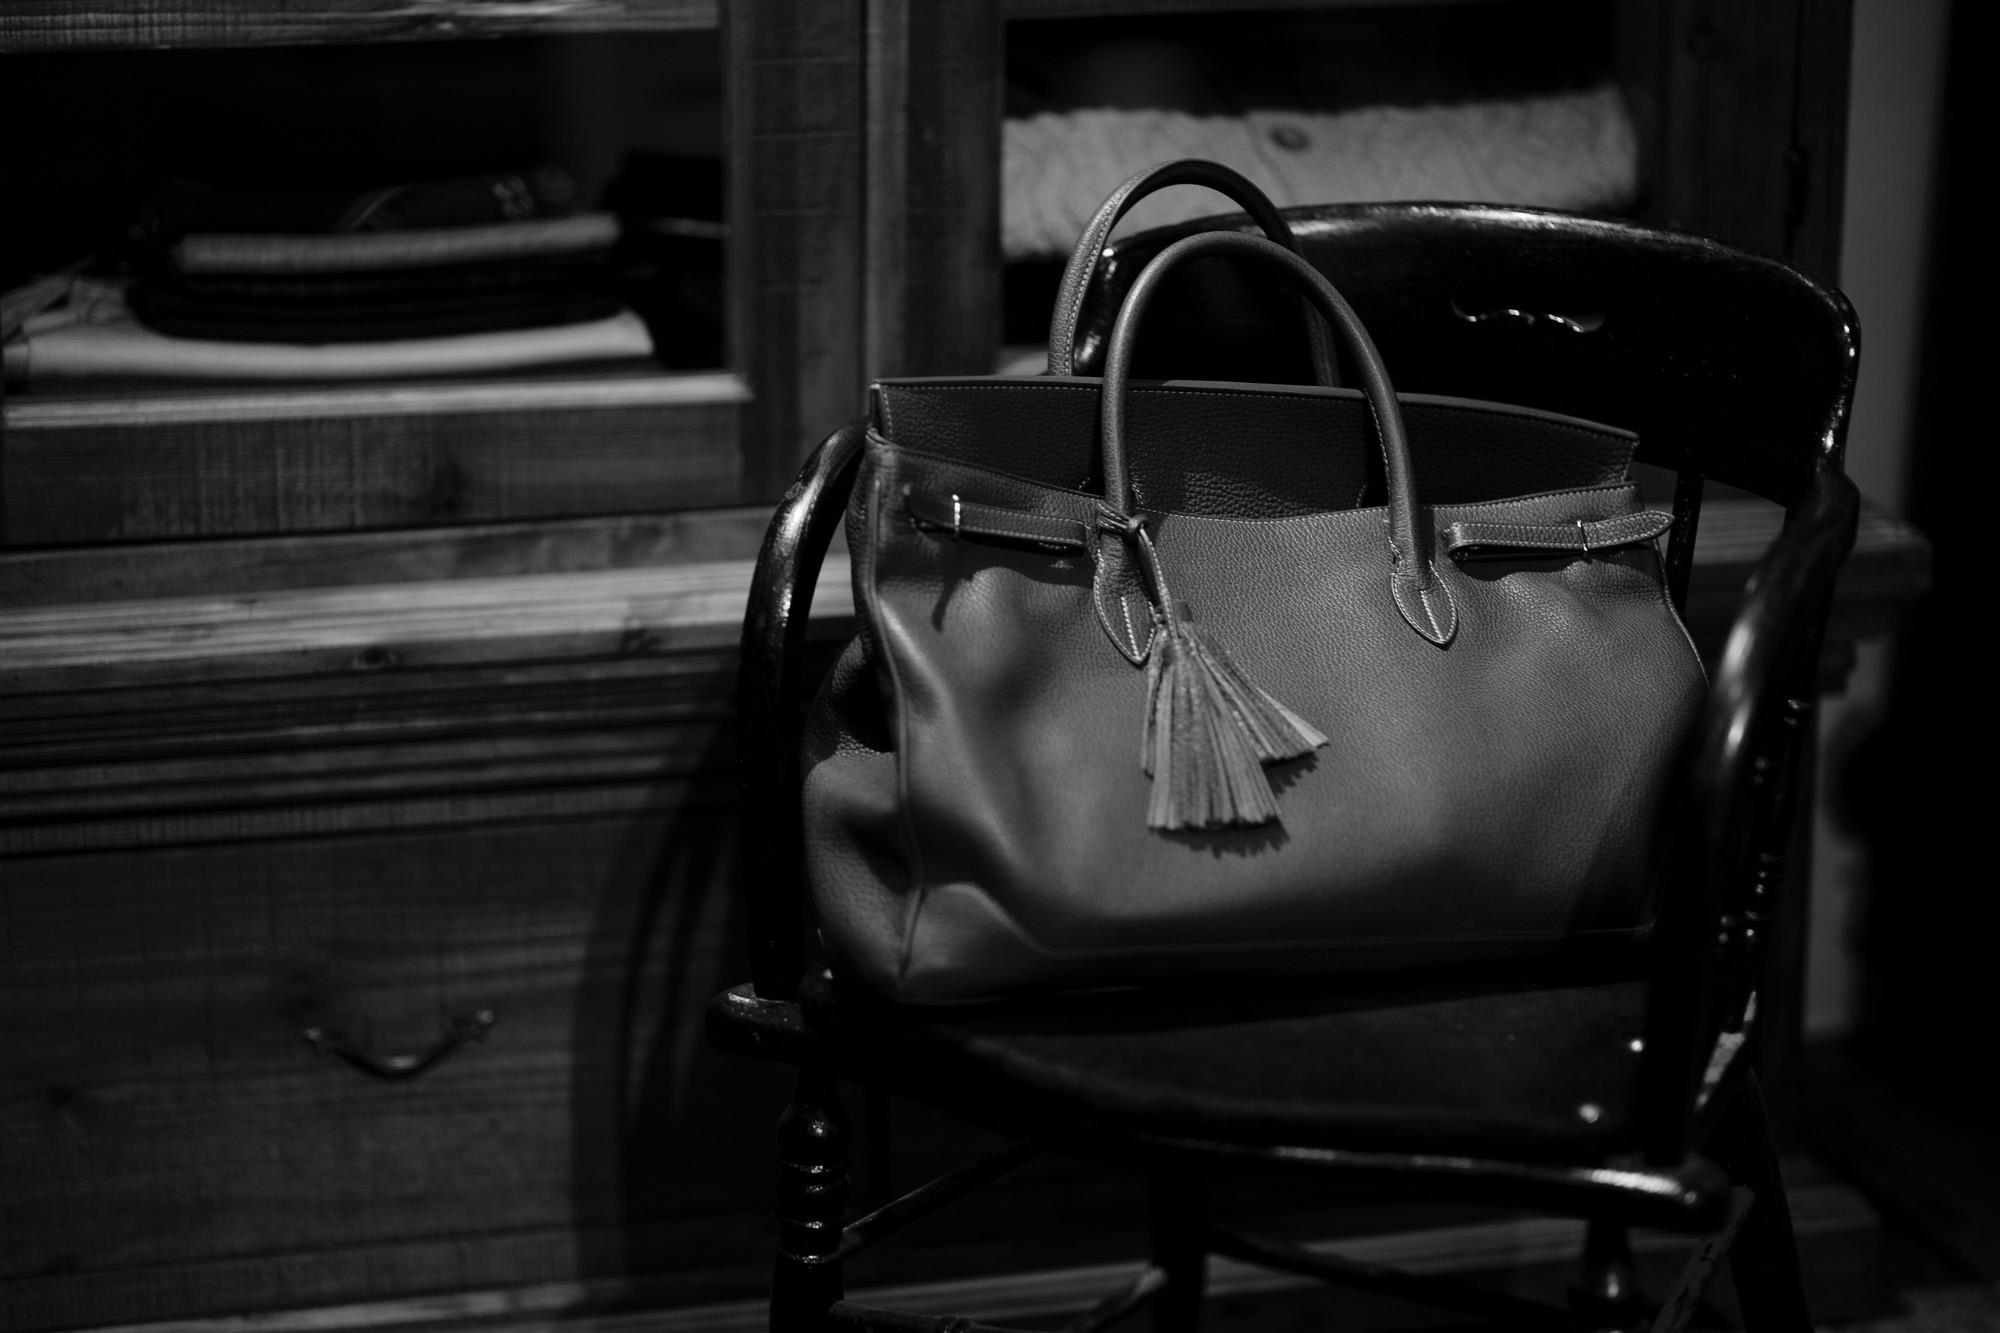 ACATE(アカーテ)OSTRO-M(オストロ-M) Montblanc leather(モンブランレザー) トートバック レザーバック NERO(ネロ) MADE IN ITALY(イタリア製) 2019 秋冬新作 【第3便ご予約開始】愛知 名古屋 altoediritto アルトエデリット トートバック